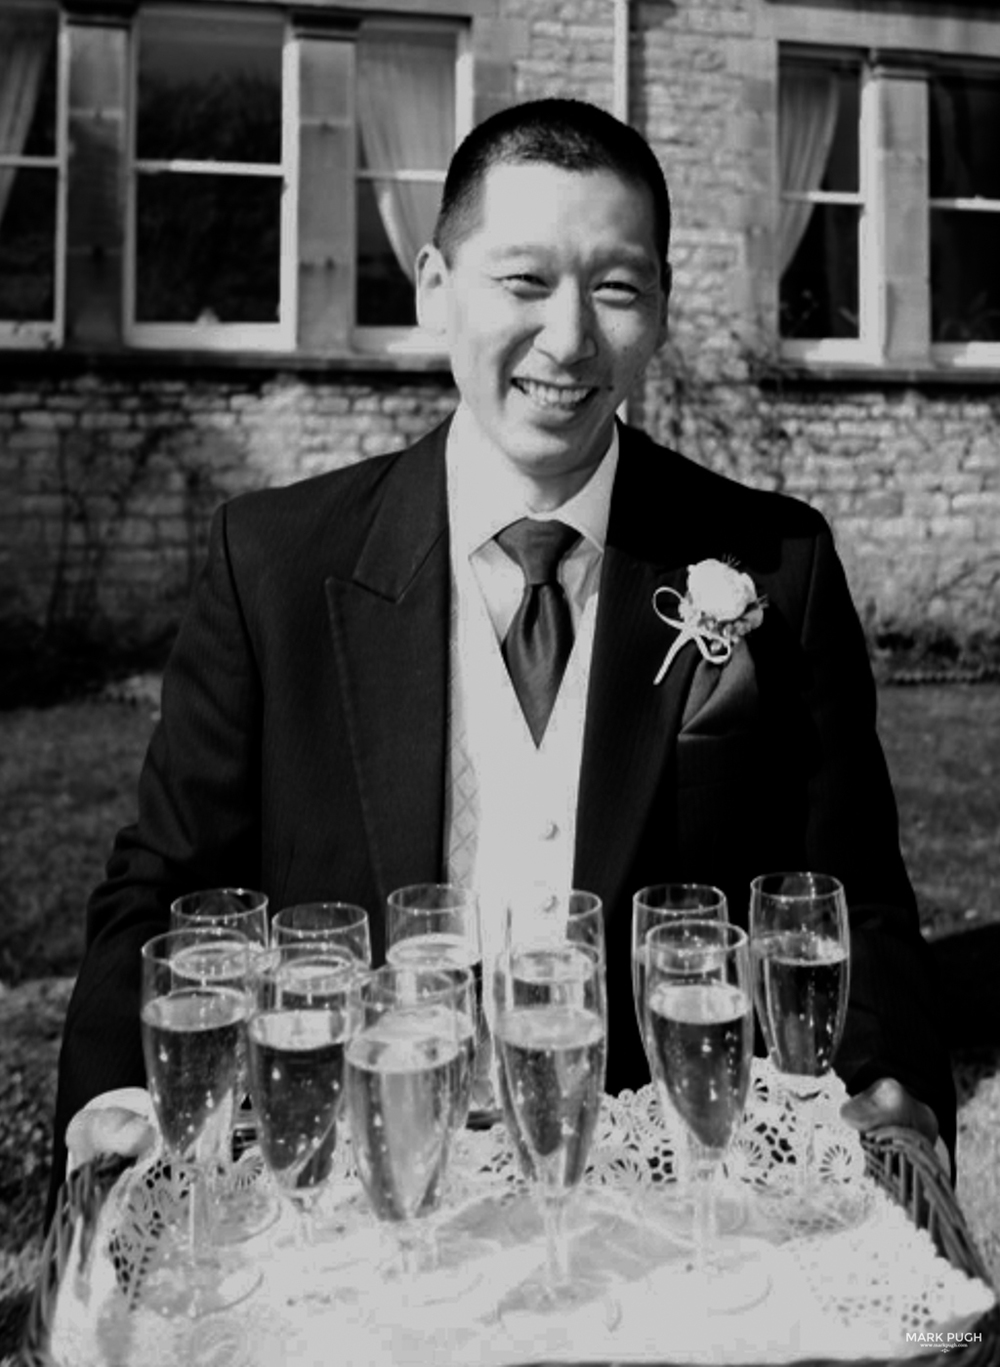 068  - Helen and Tim - Wedding Photography at Chatsworth House Bakewell Derbyshire DE45 1PP - Wedding Photographer Mark Pugh www.markpugh.com -139.JPG